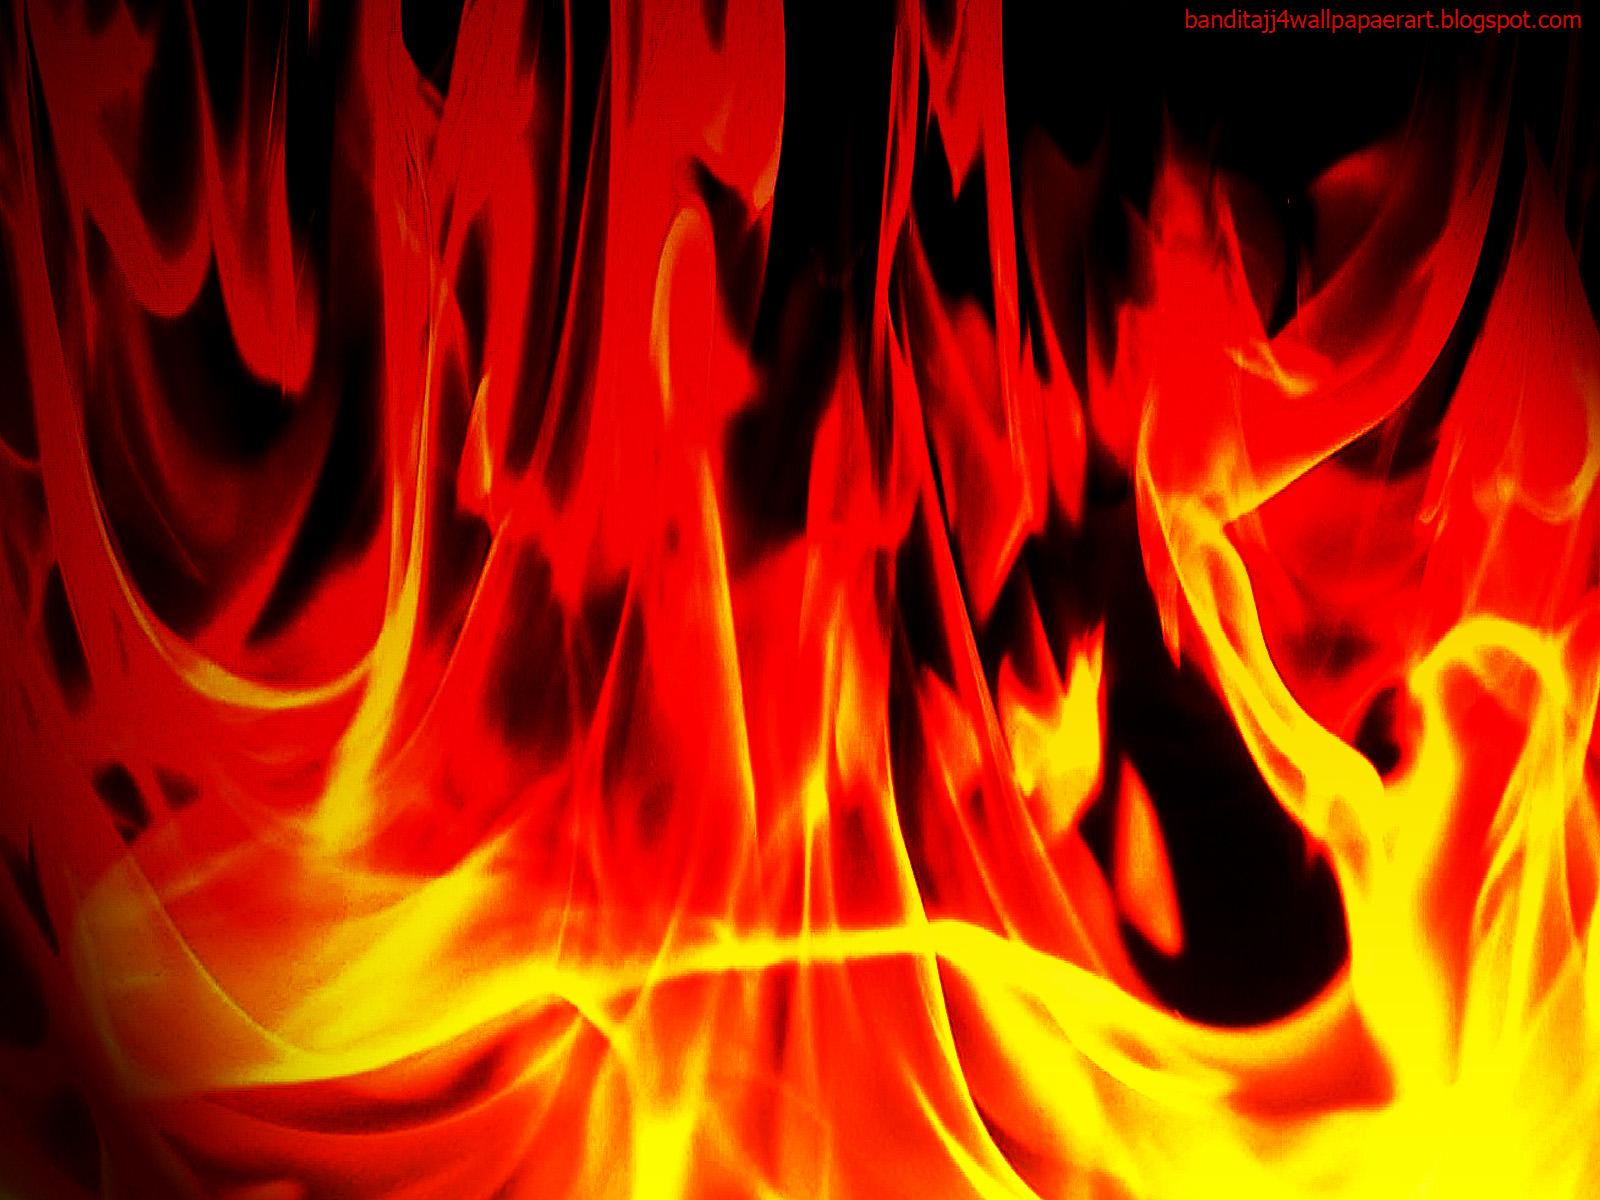 Fire Wallpapers Free Download Wallpaper - Fire Flames , HD Wallpaper & Backgrounds